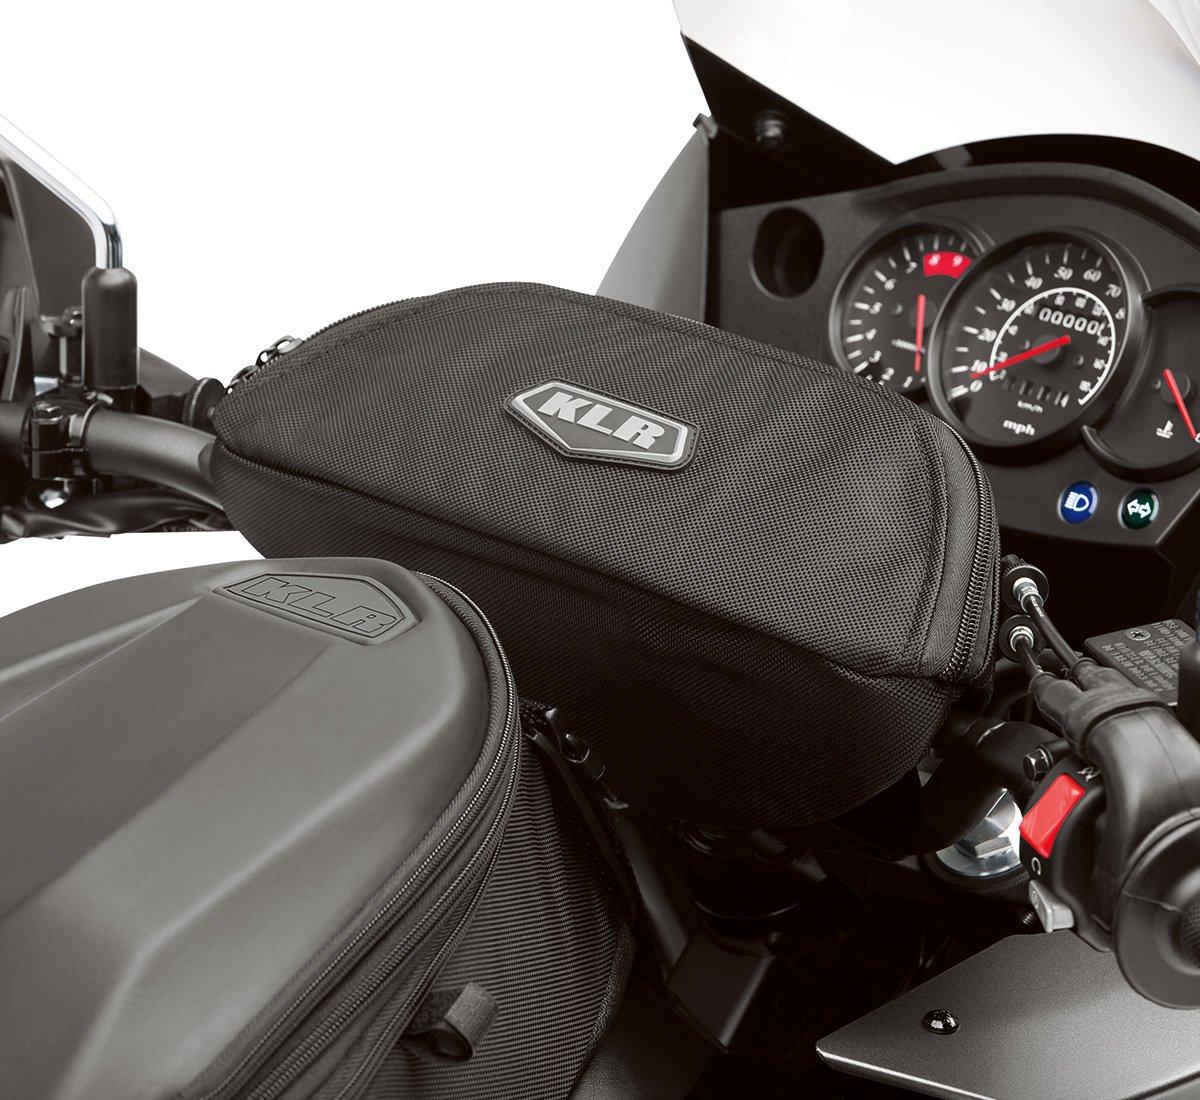 Kawasaki 2008-2016 KLR 650 KLR650 Trans Handlebar Bag K57003-103A New OEM by Kawasaki